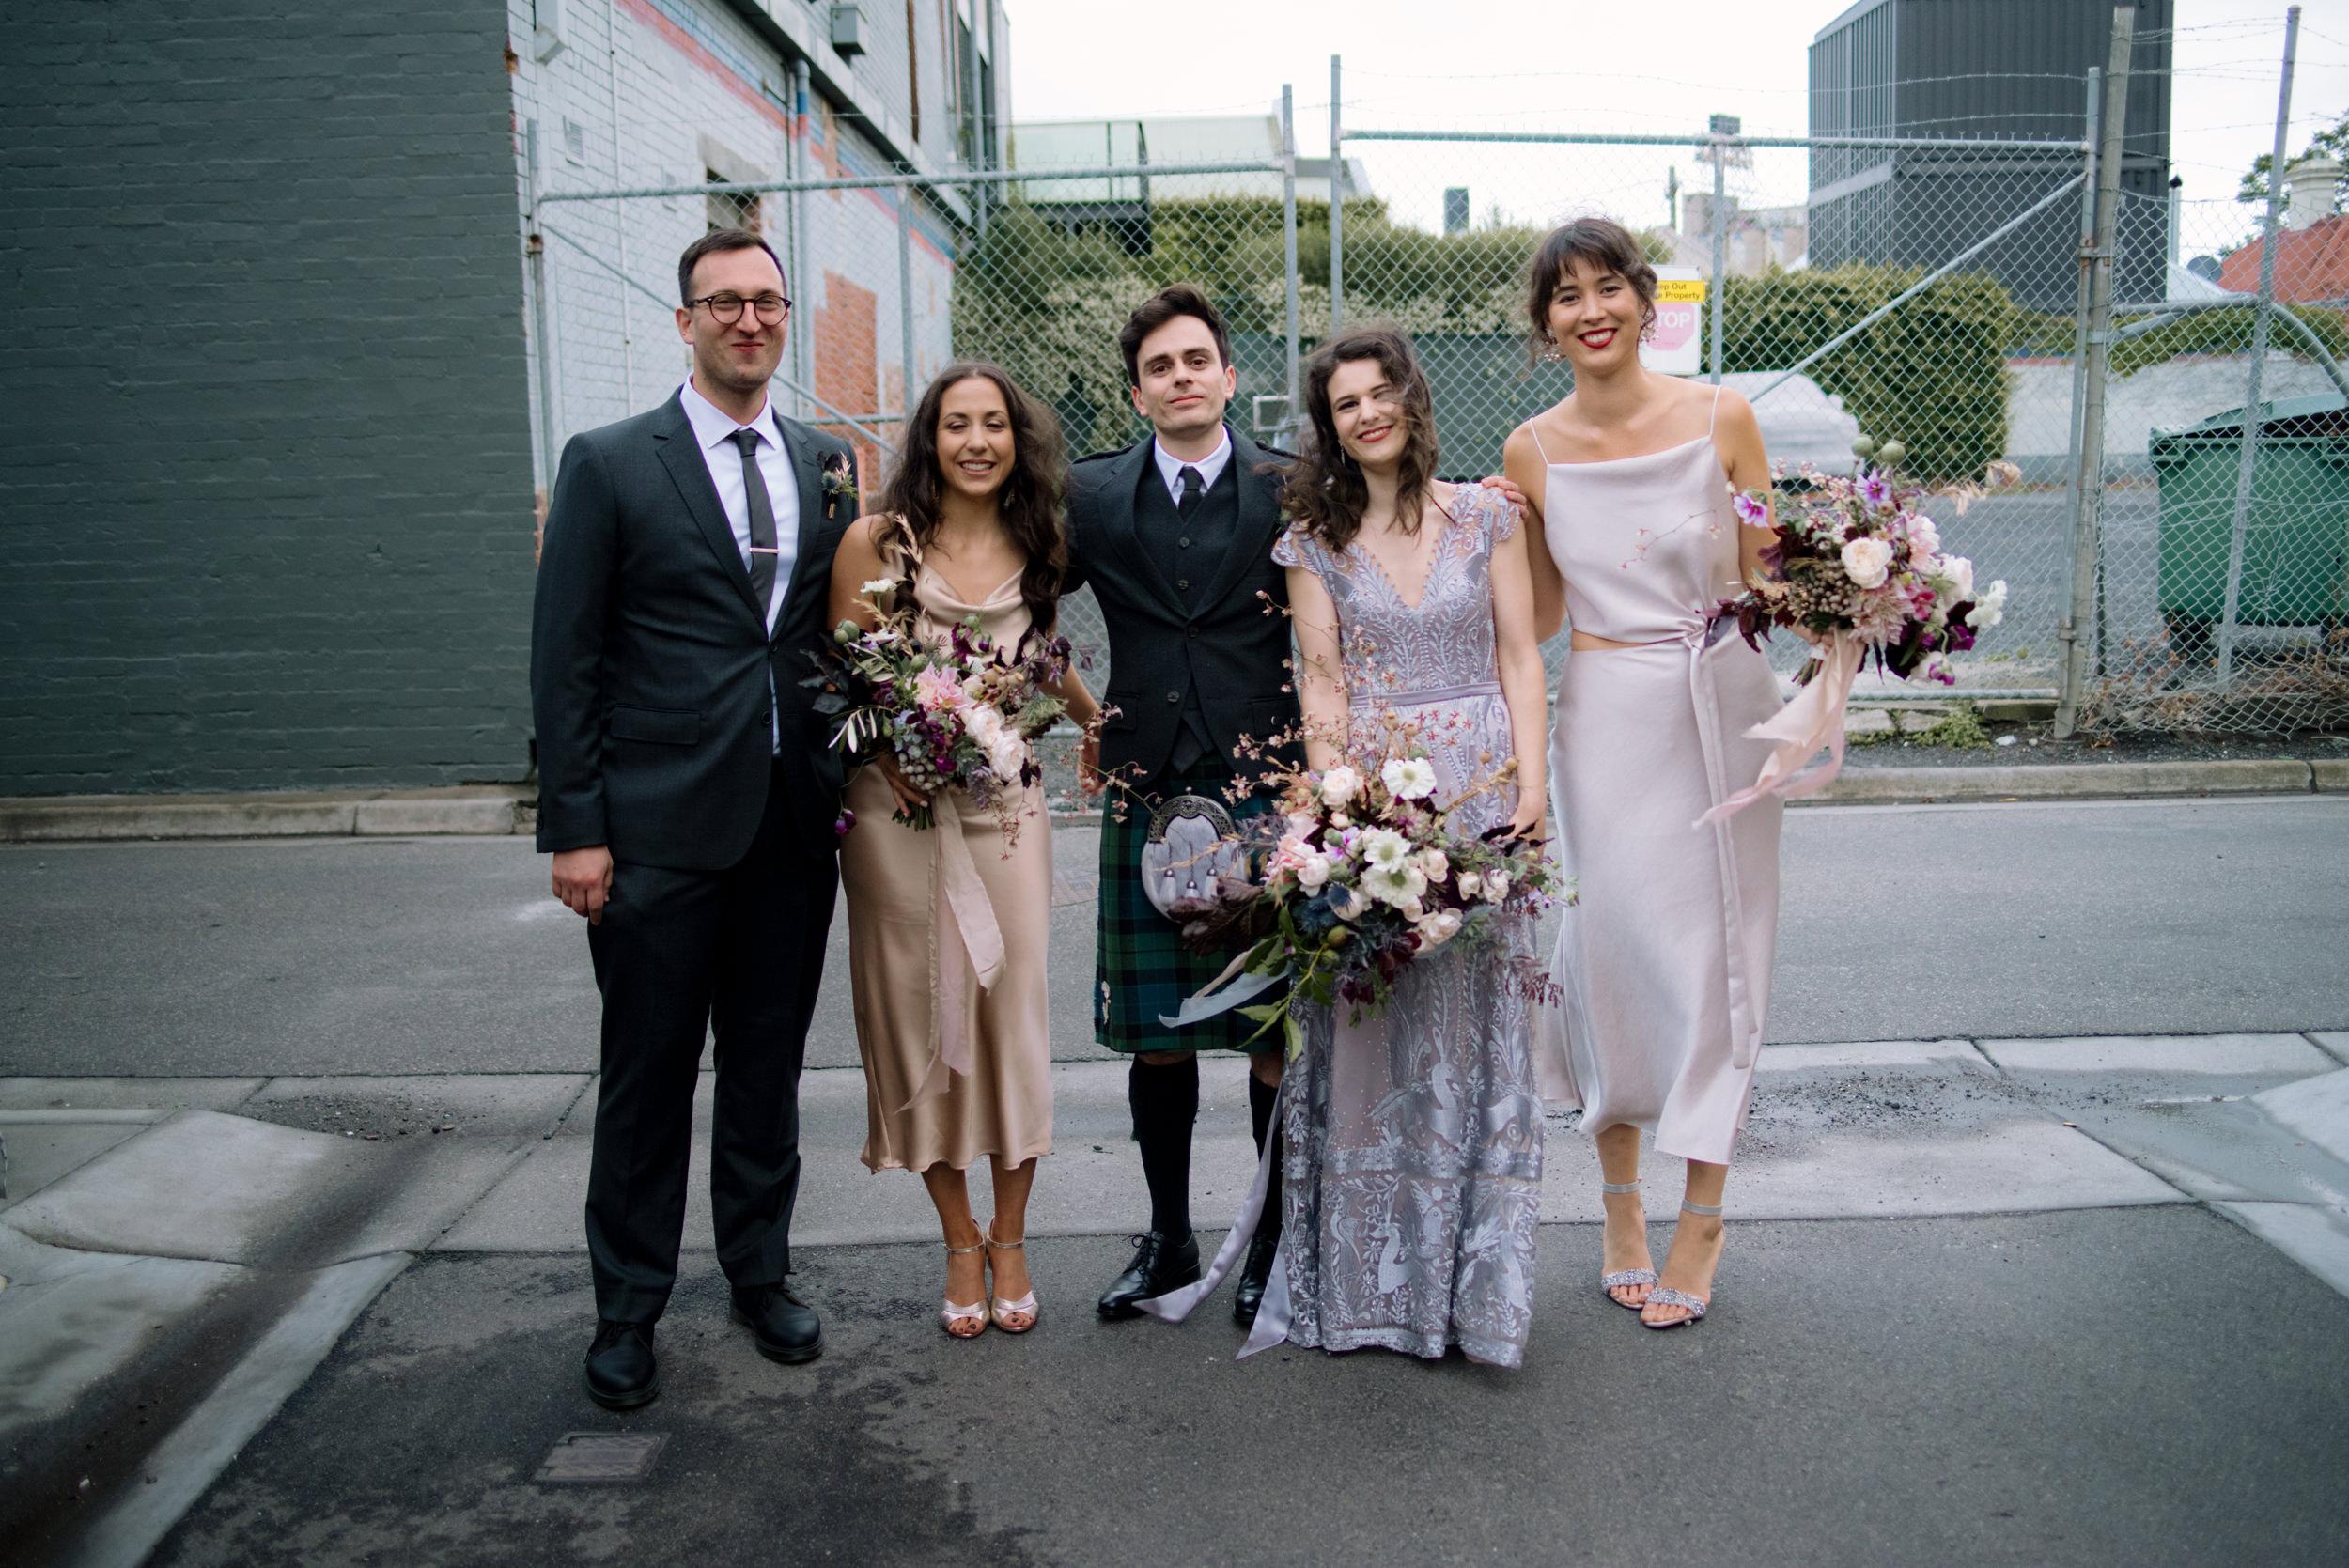 I-Got-You-Babe-&.Co.-Glasshaus-Wedding-Charlotte-Cameron0098.JPG